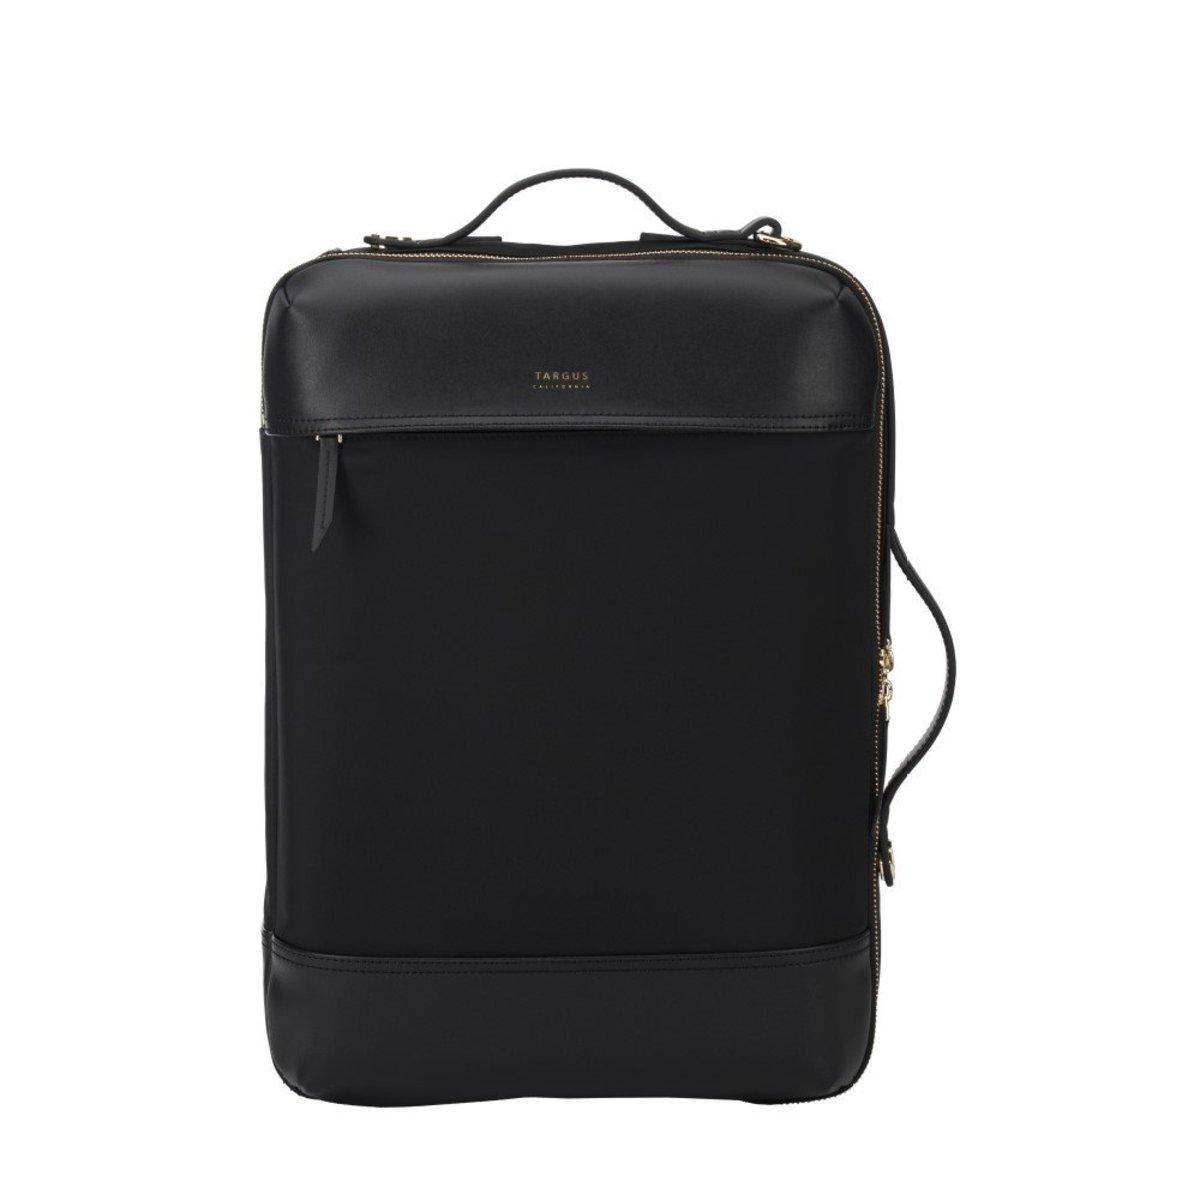 "TSB947AP Newport 15"" Convertible 3-in-1 Backpack - Black"